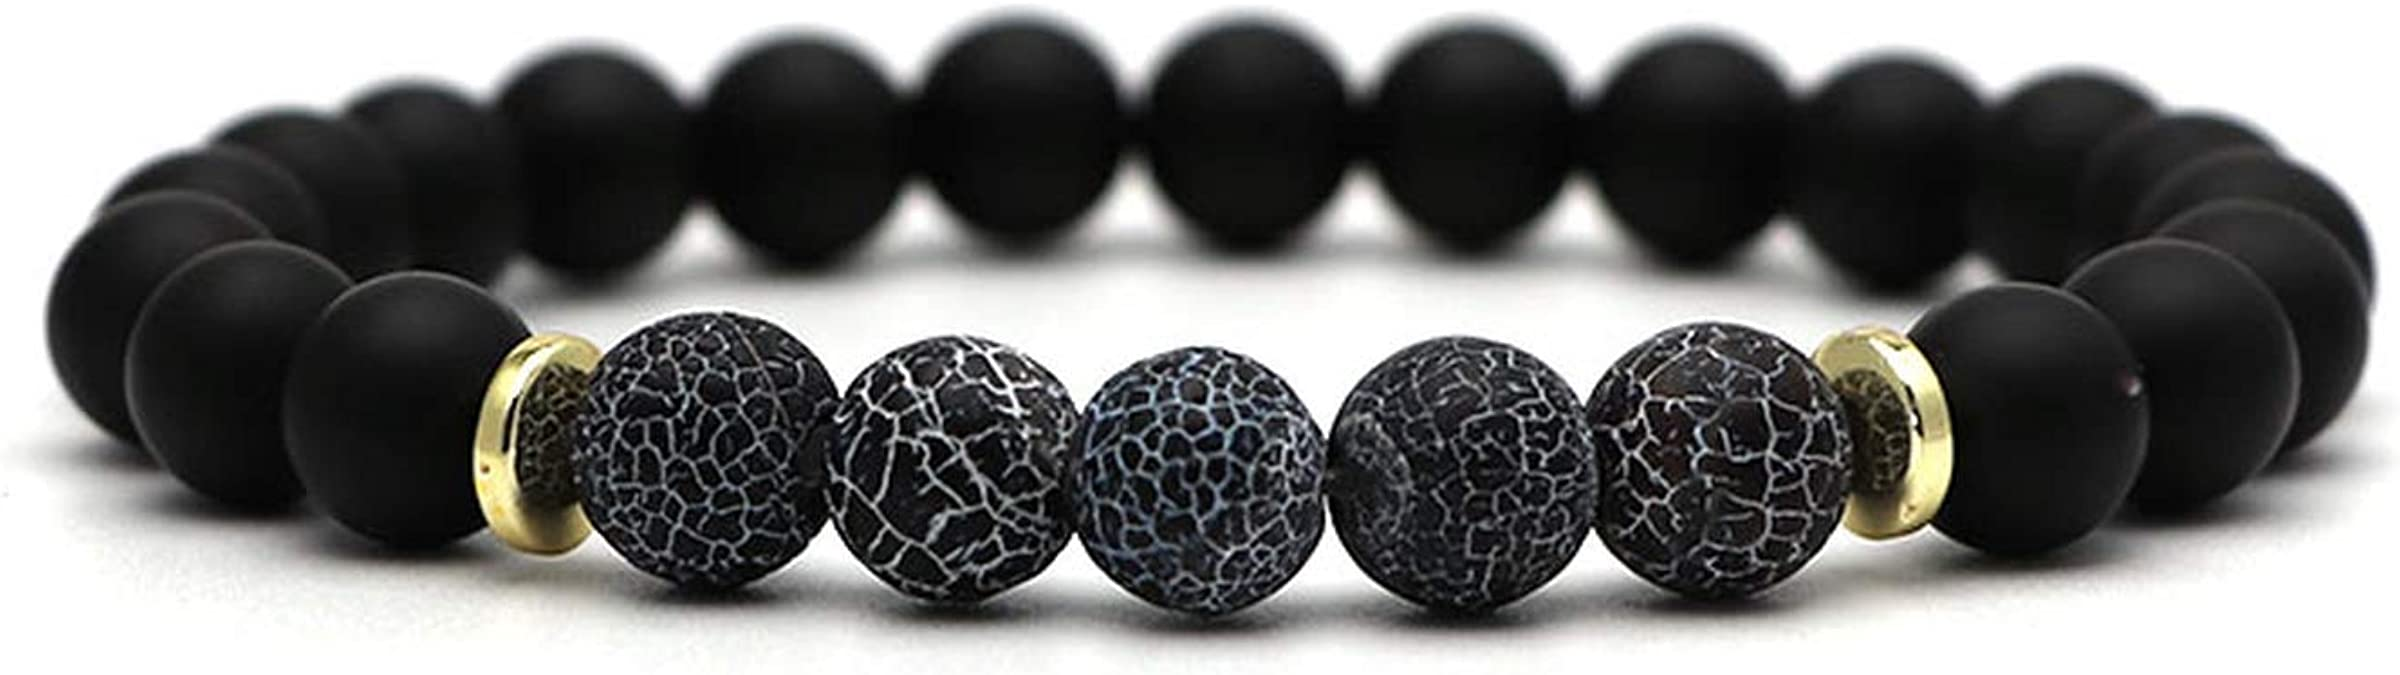 Hynsin Natural Stone Bracelet Men Jewelry Six-Word Mantra Tiger Eye Beads Stretch Bracelet for Women Men Lucky Bracelets /& Bangles